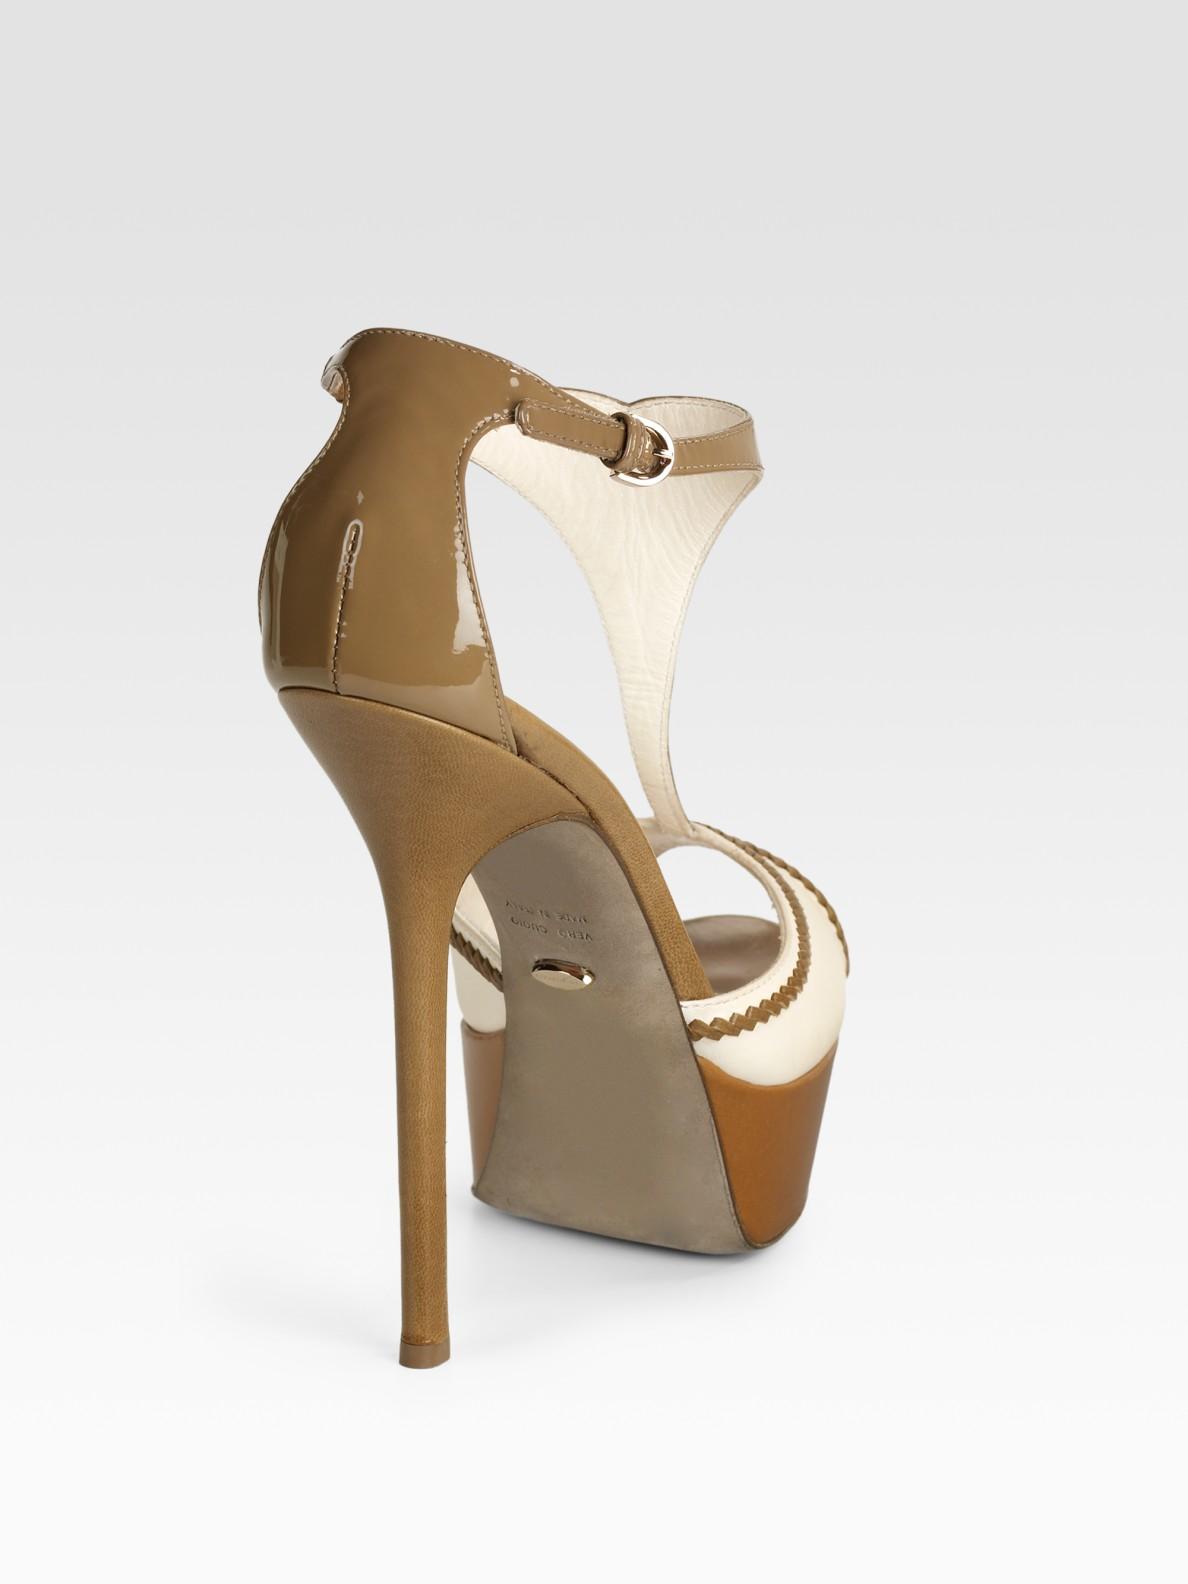 Sergio Rossi T Strap Leather Amp Patent Platform Sandals In